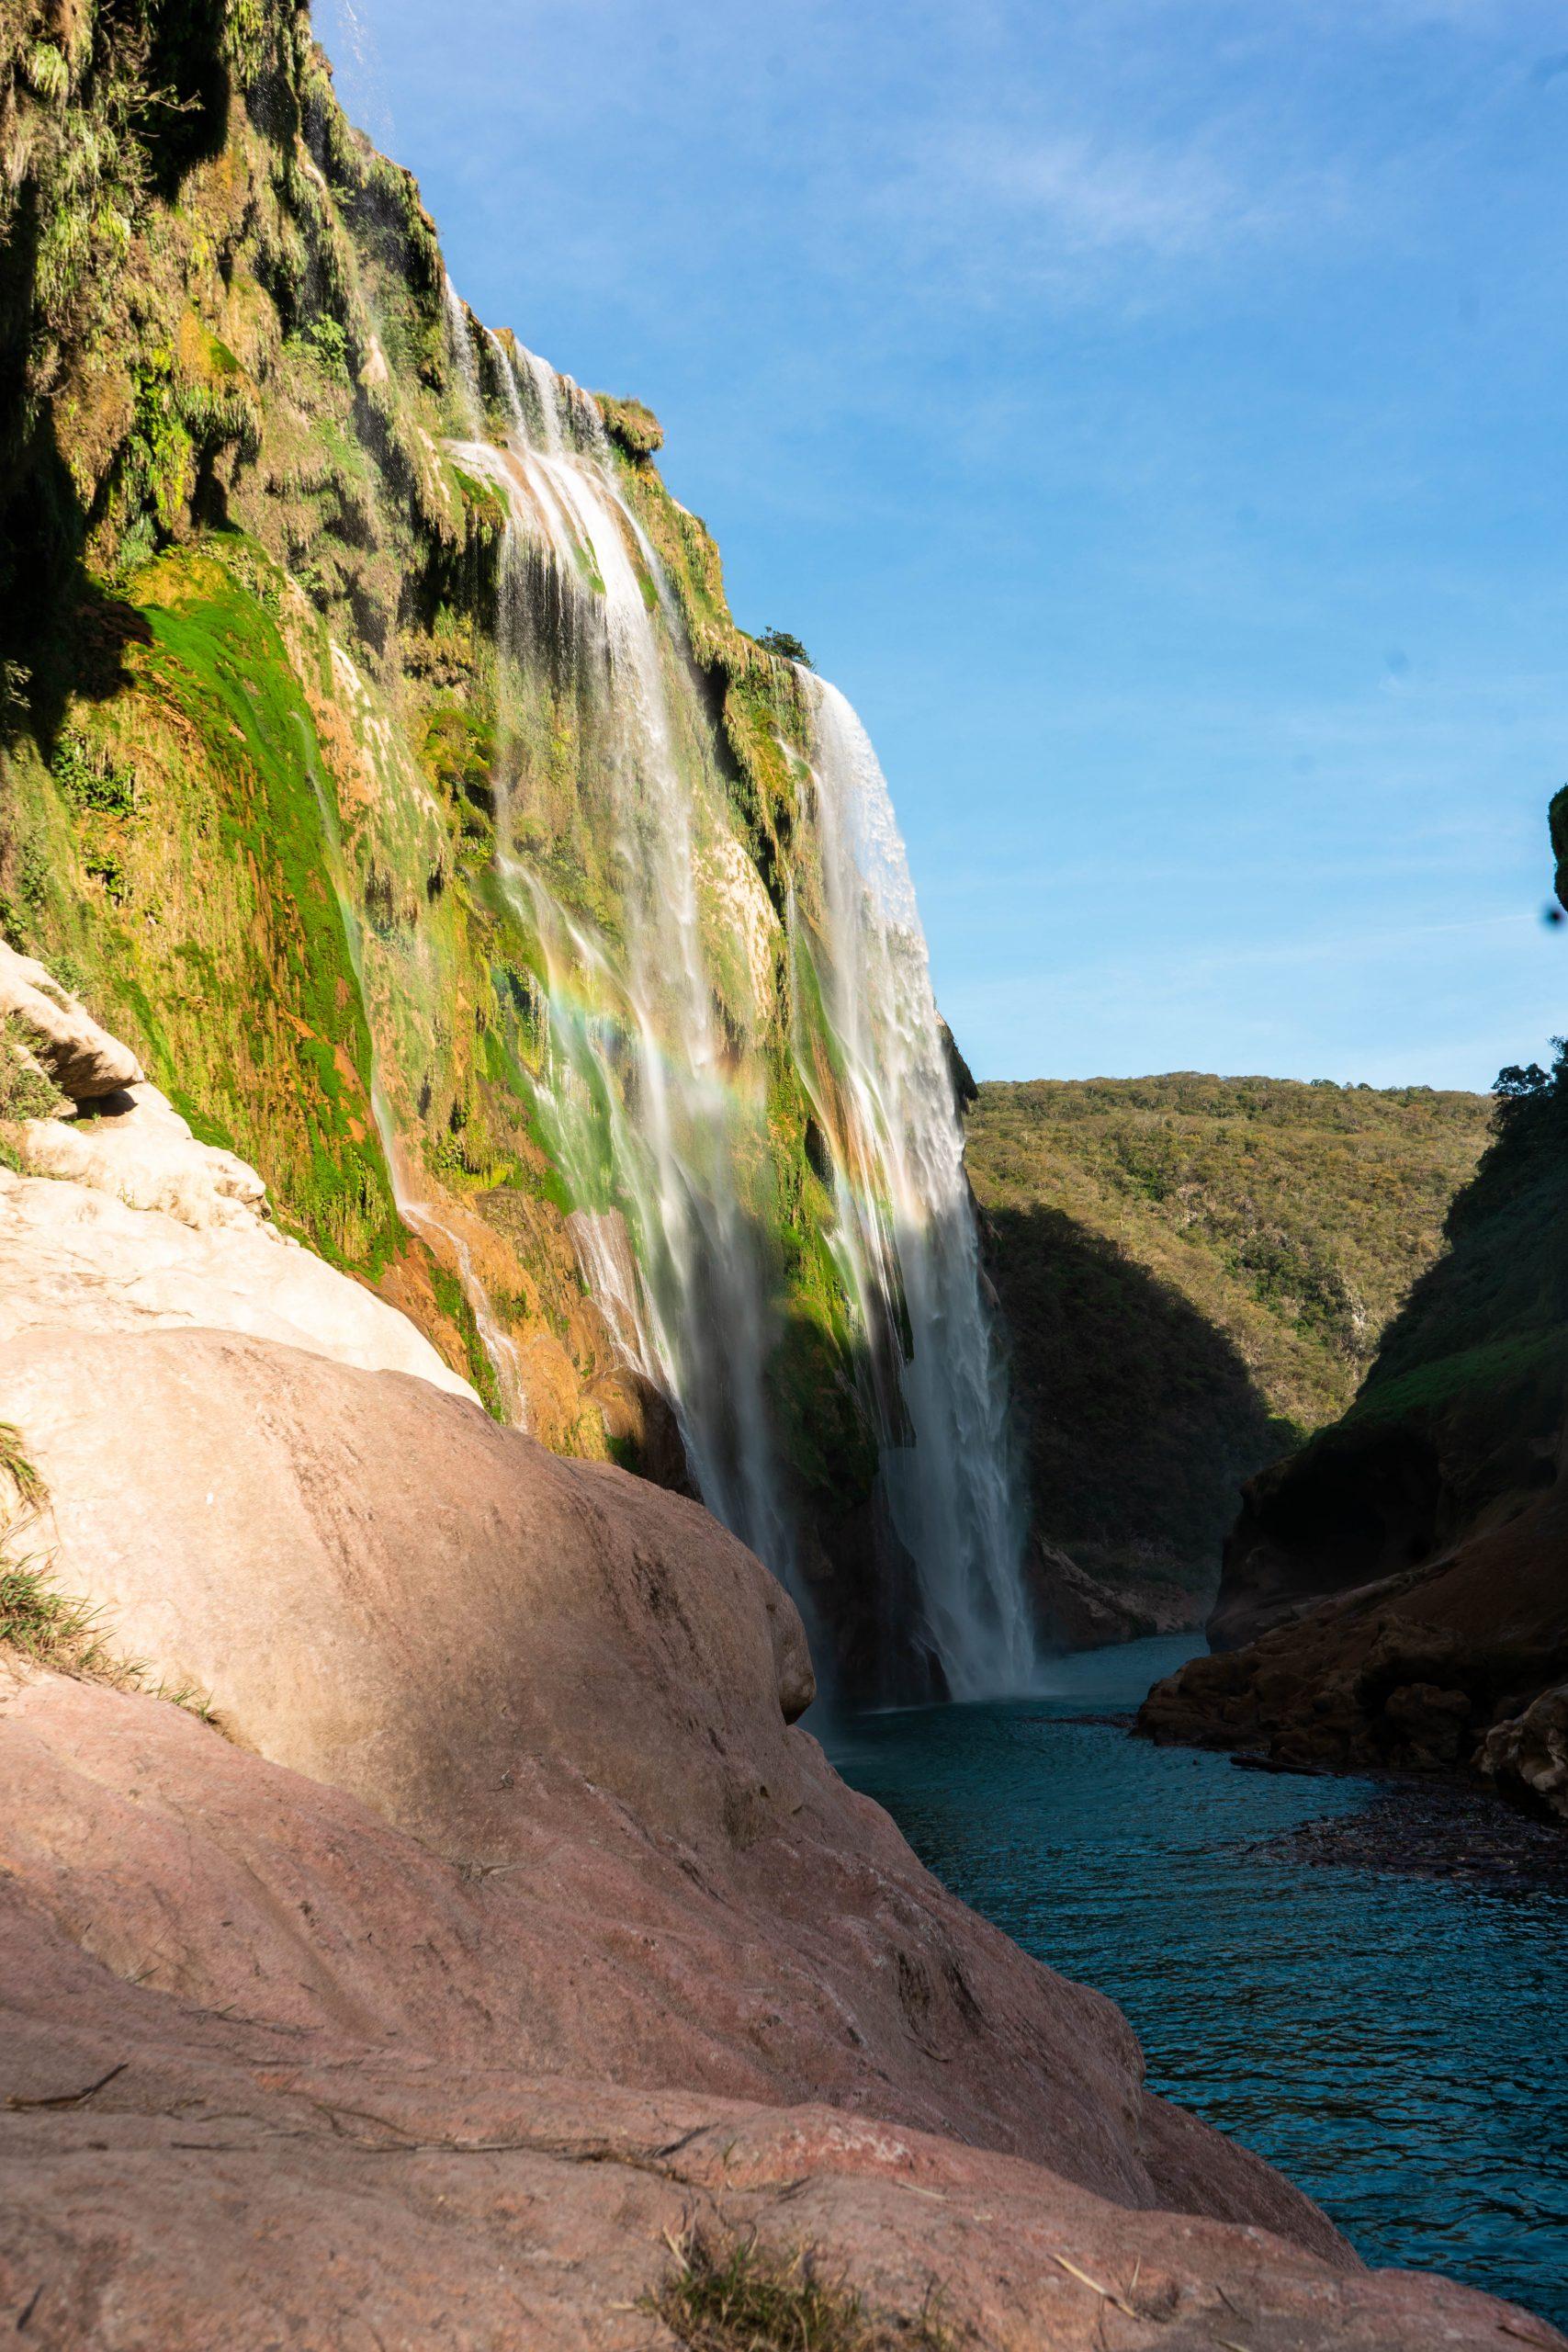 cascada de tamul la huasteca potosina san luis potosi mexico canyon waterfall rainforest